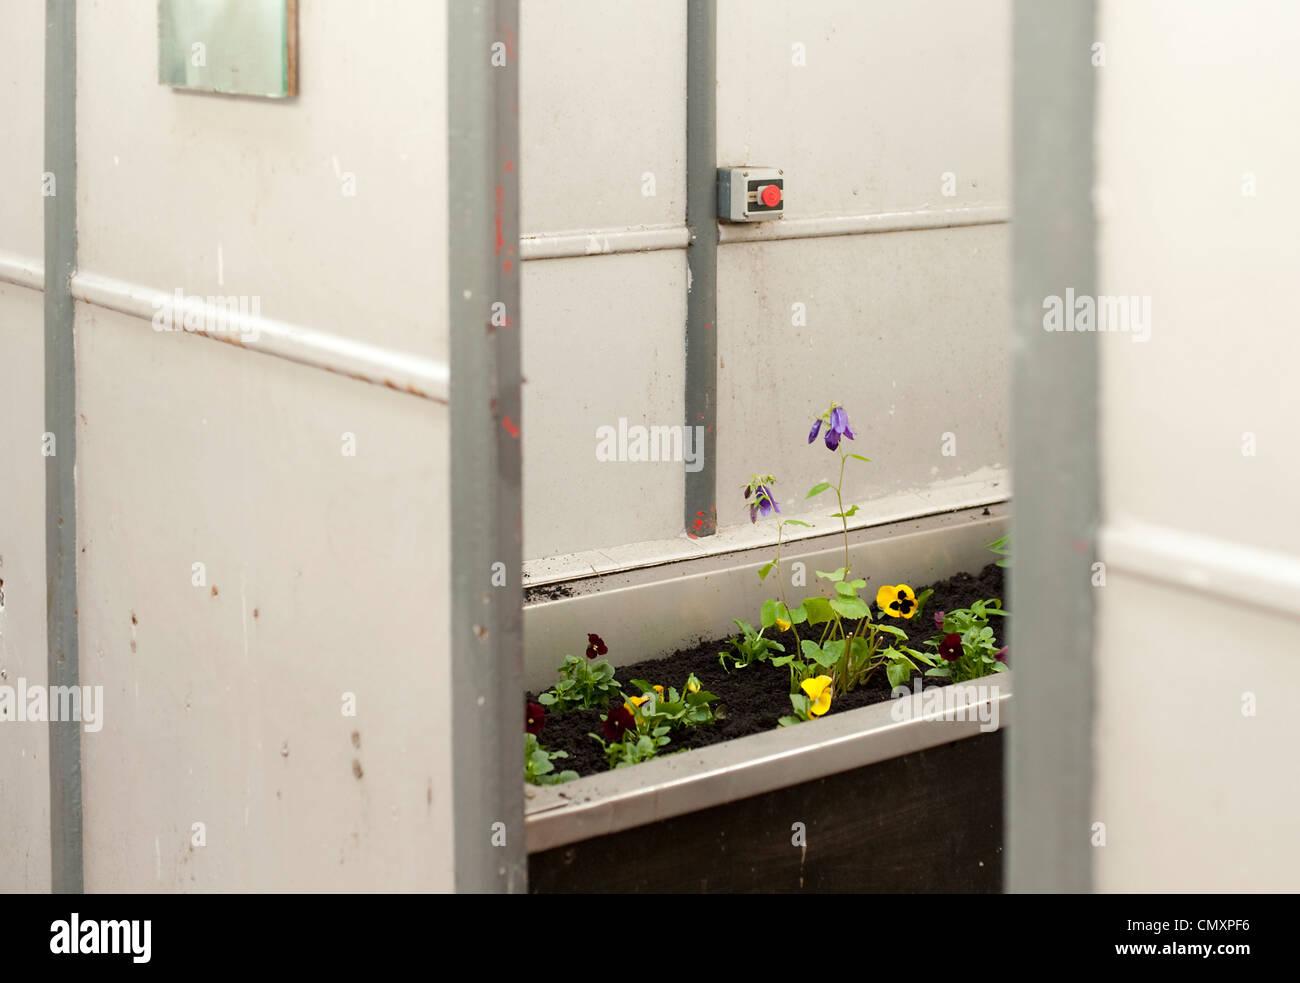 Fußbodenplatten Xp ~ Bath cubicle stockfotos & bath cubicle bilder alamy